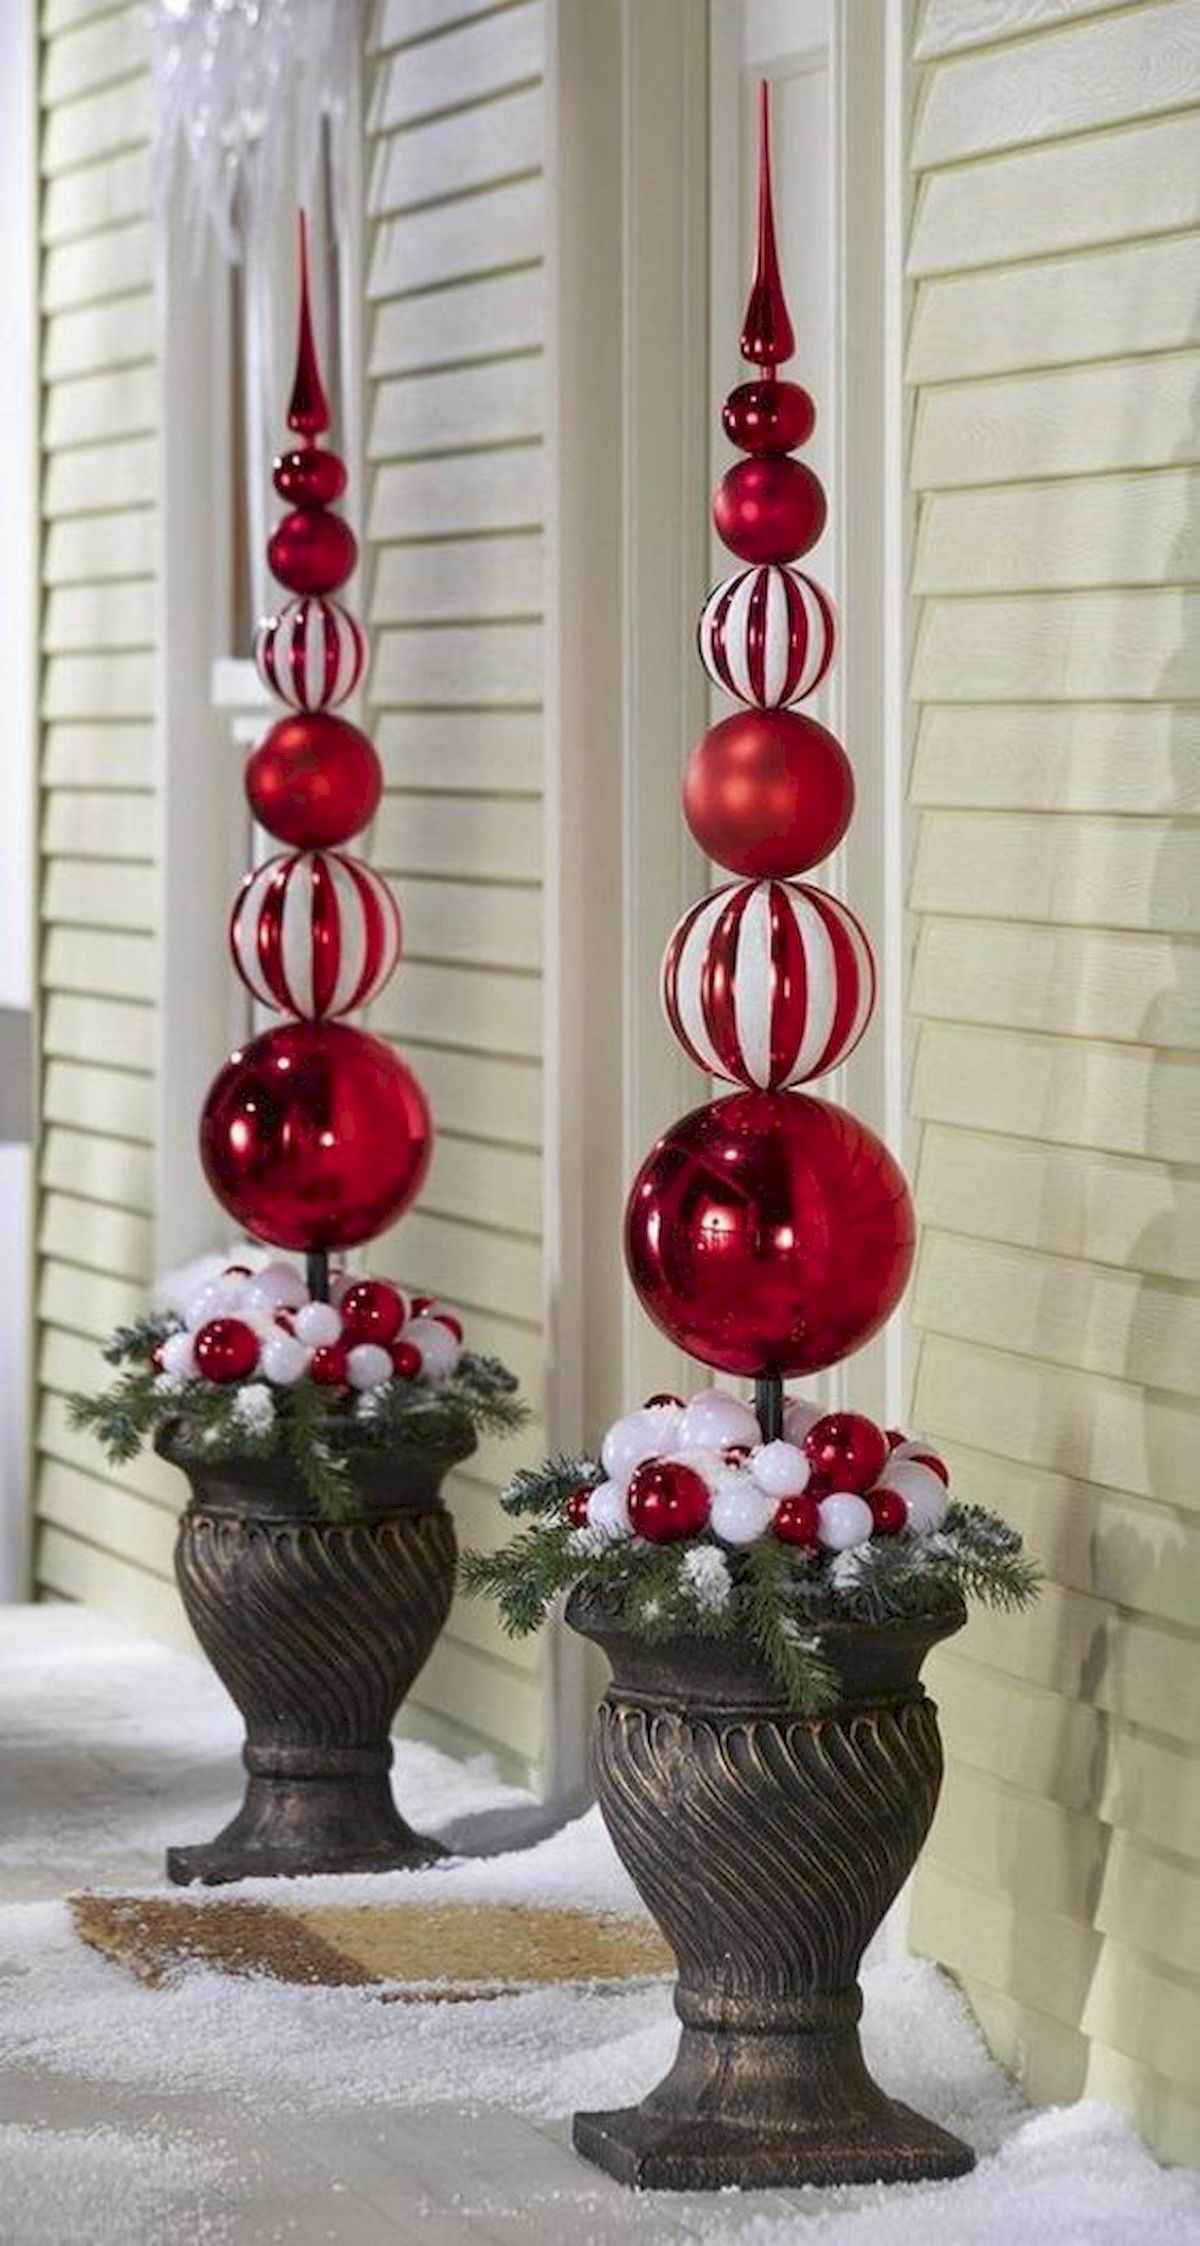 40 amazing outdoor christmas decorations ideas (15)